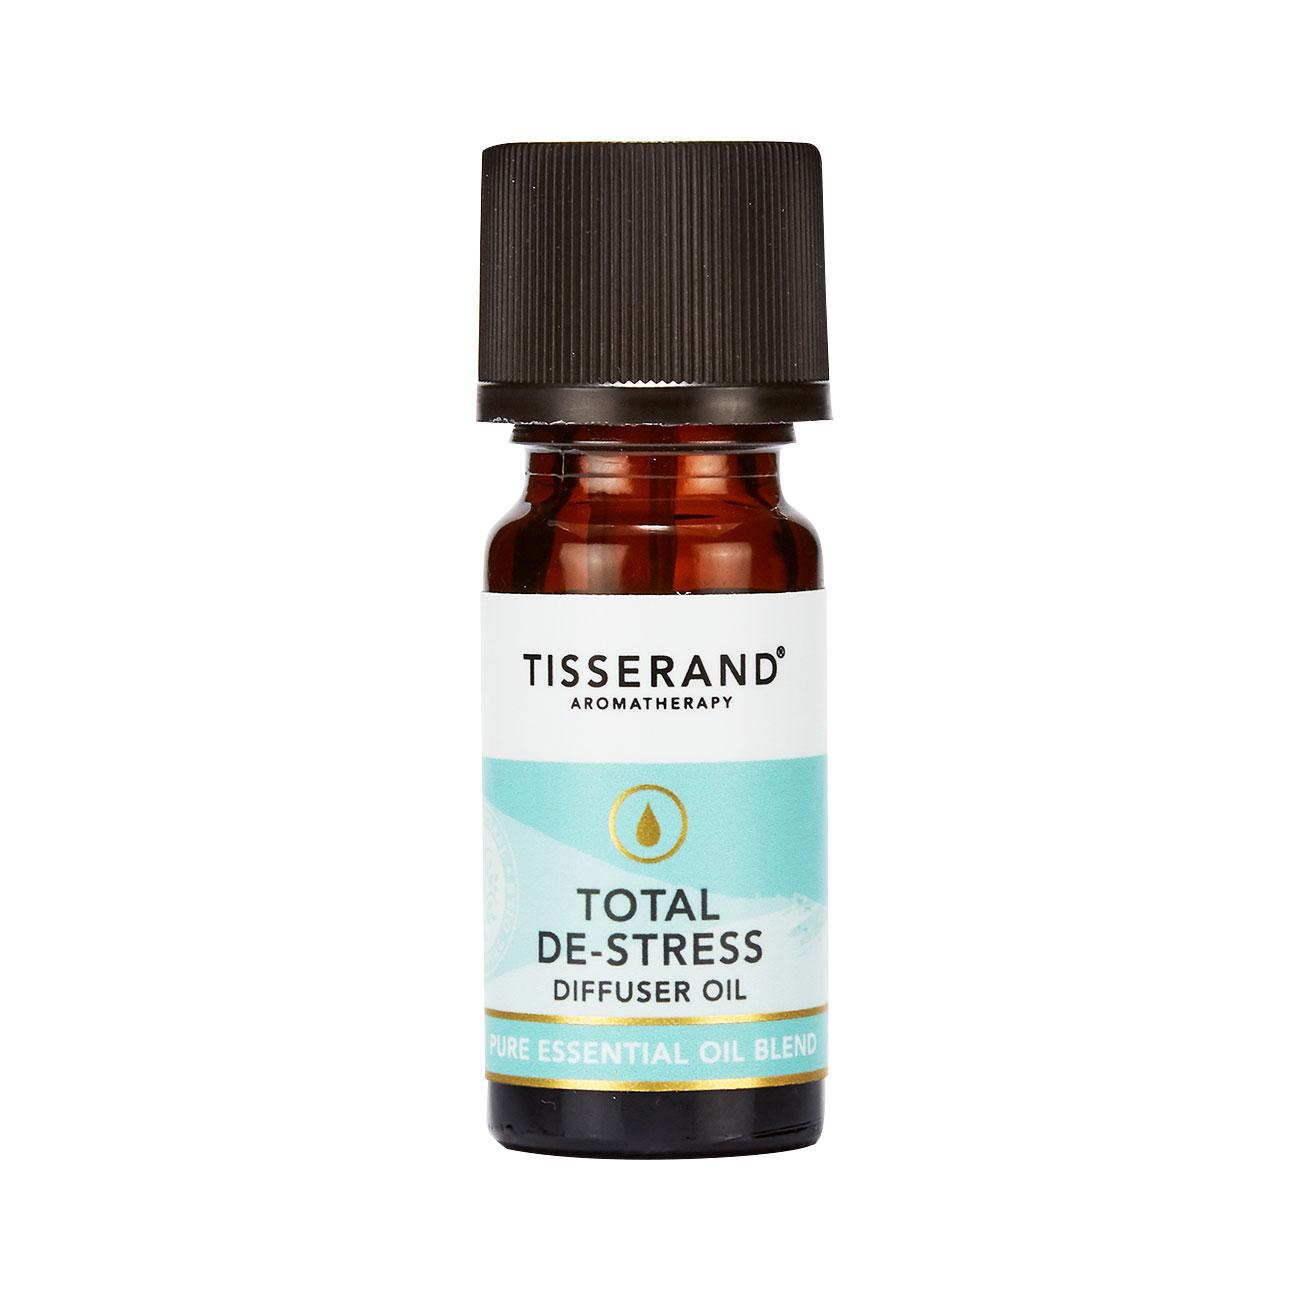 Total De-Stress Diffuser Oil 9ml